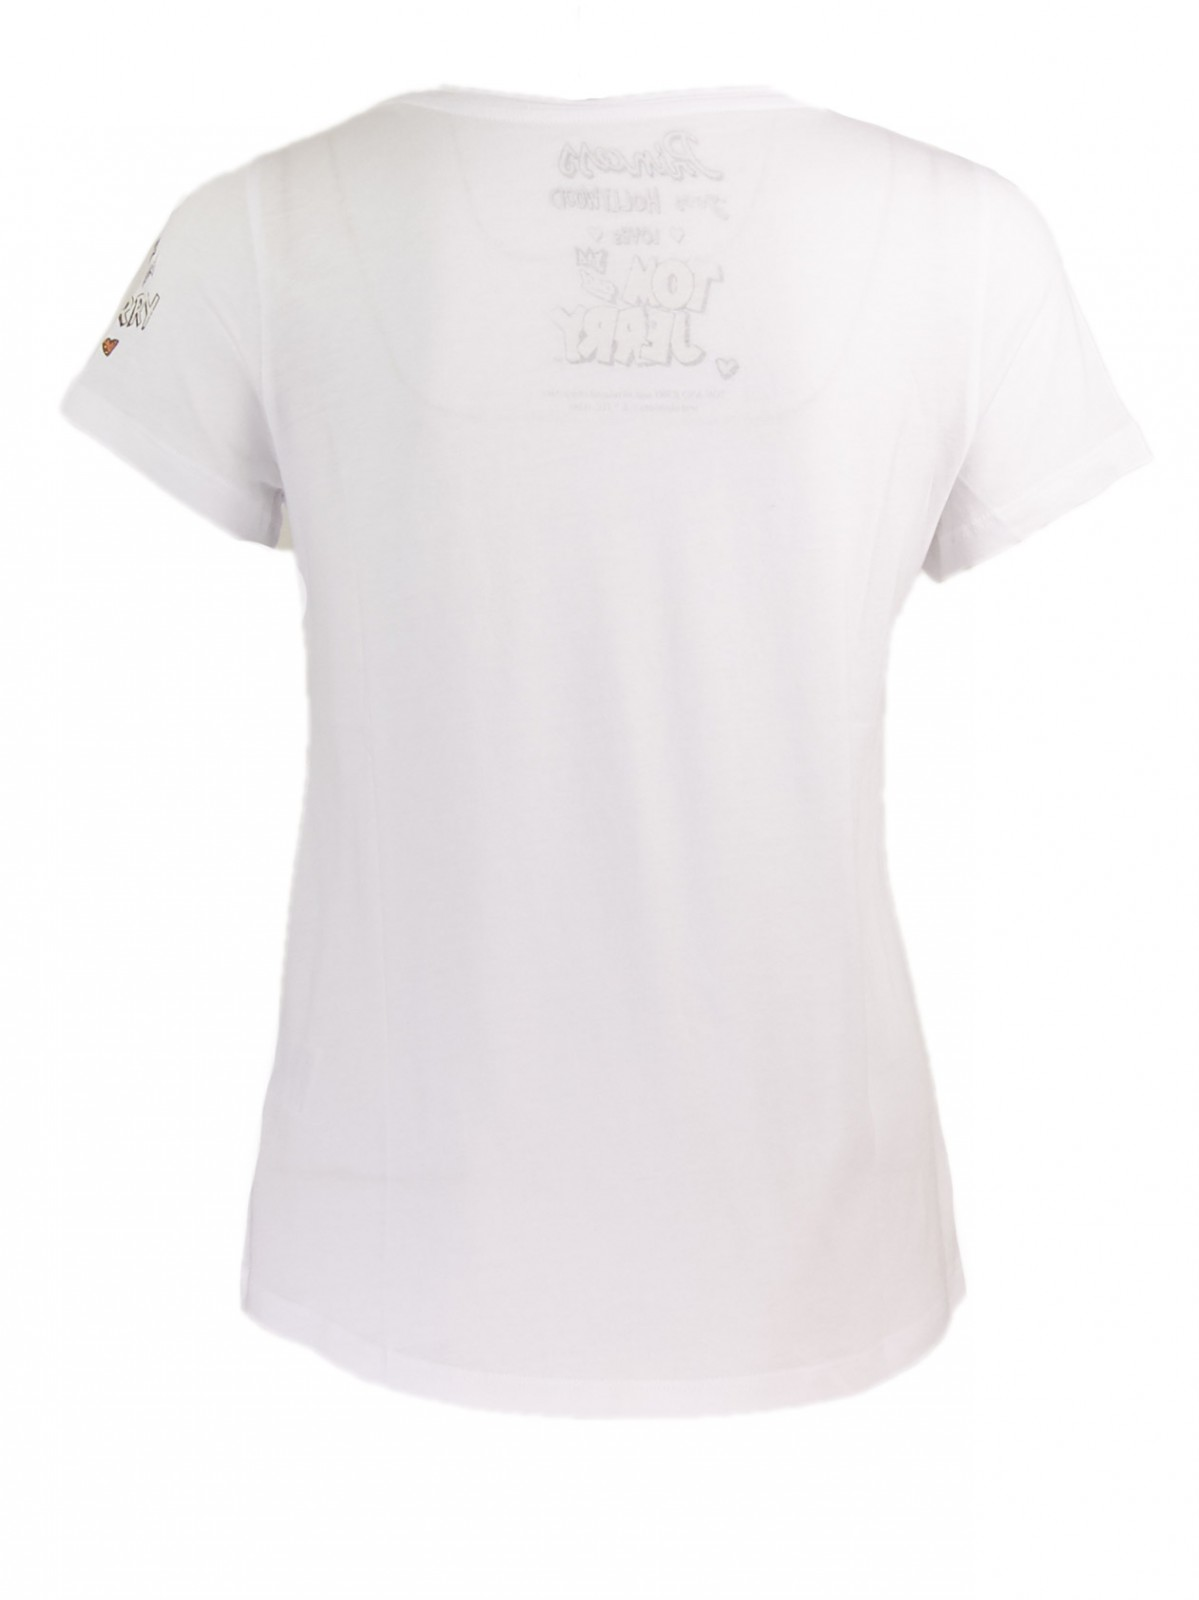 Jerry Trouble Maker T-Shirt